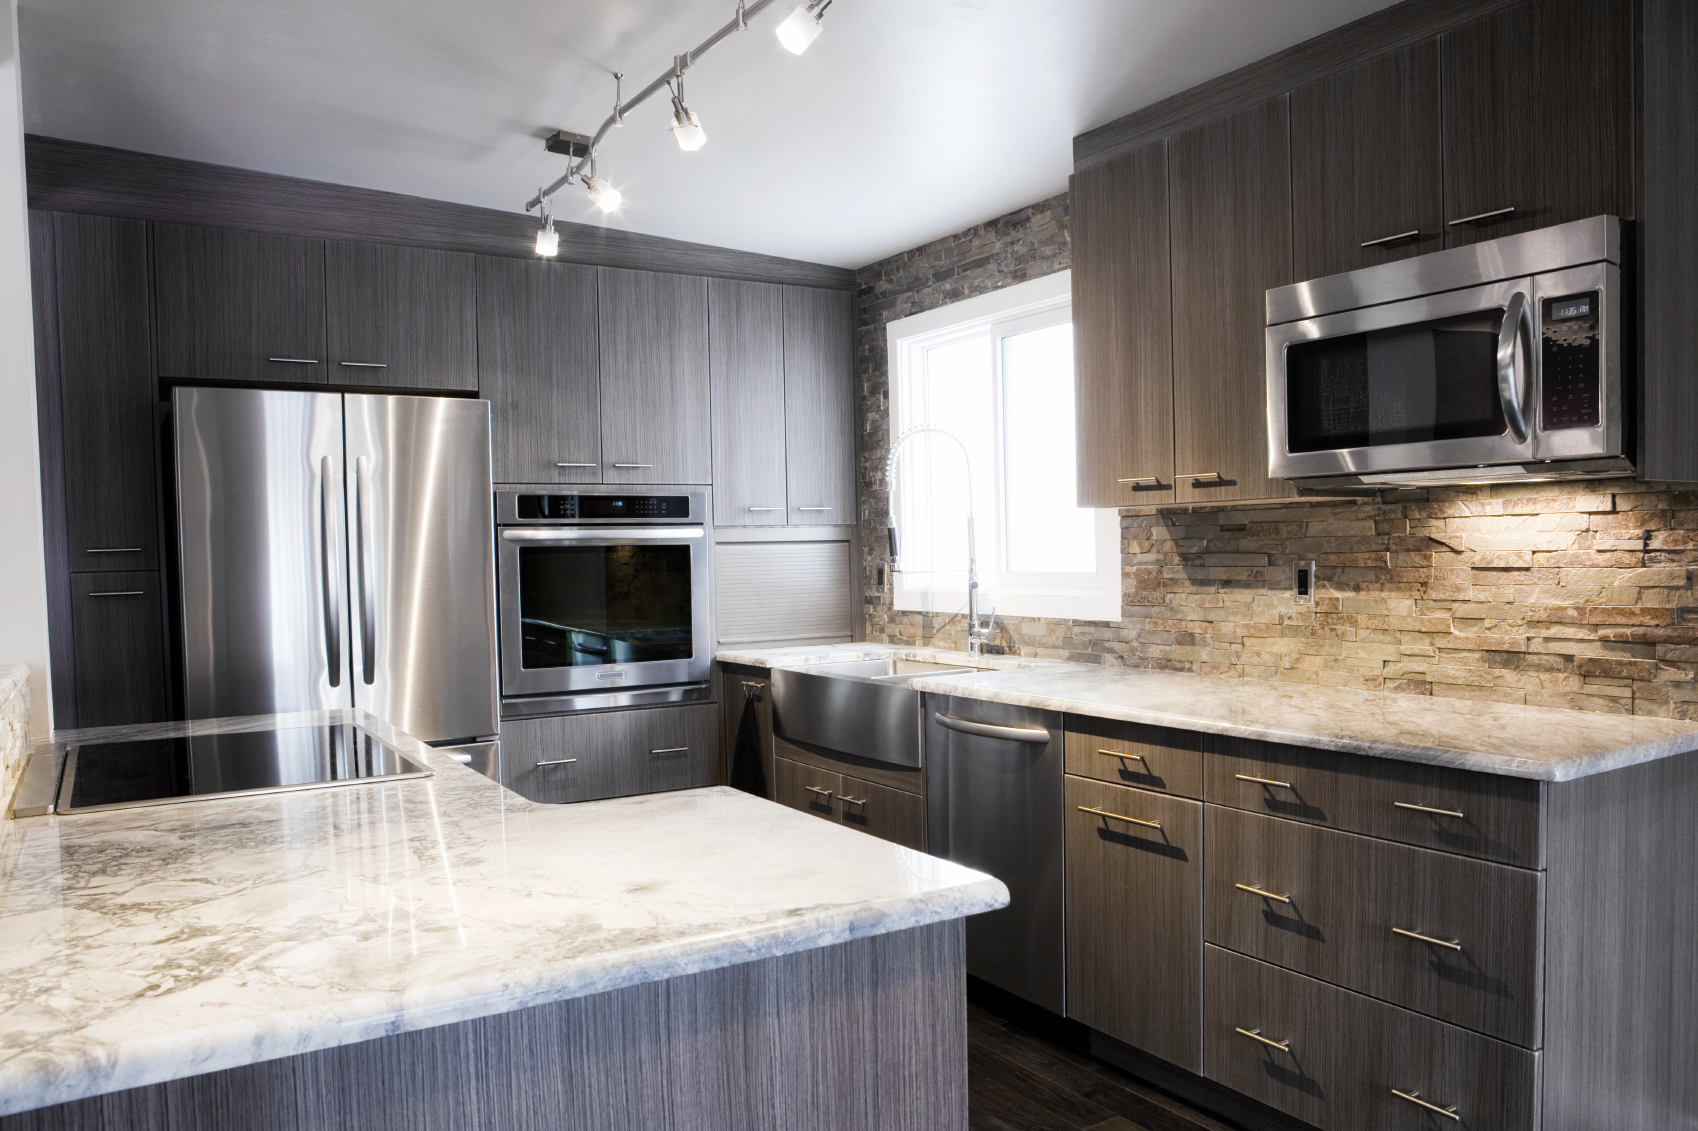 60 Ultra Modern Custom Kitchen Designs (Part 1) on Modern Backsplash For Dark Countertops  id=35243